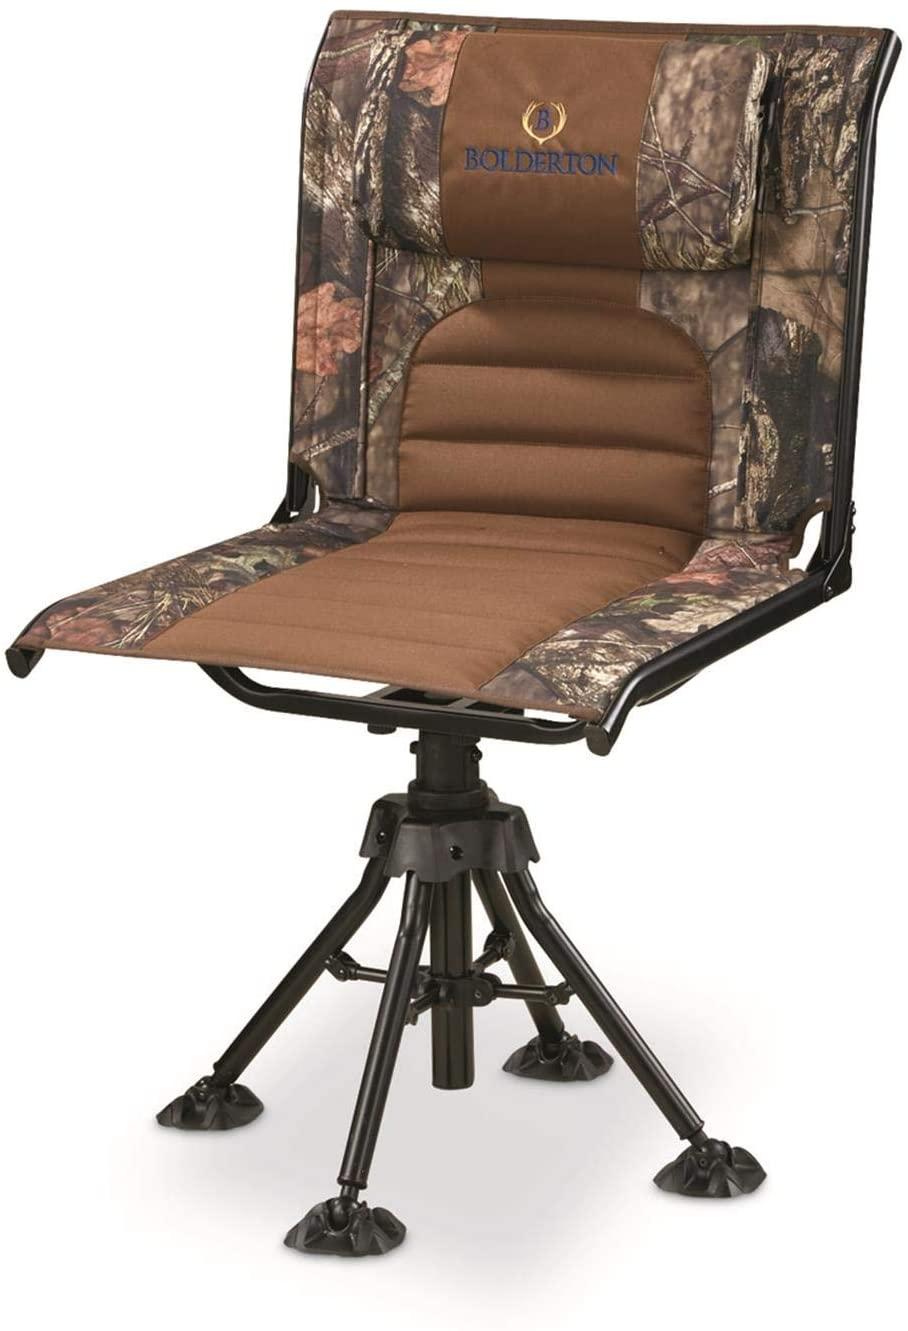 Bolderton 360 Comfort Swivel Camo Hunting Chair, Mossy Oak Break-Up Country